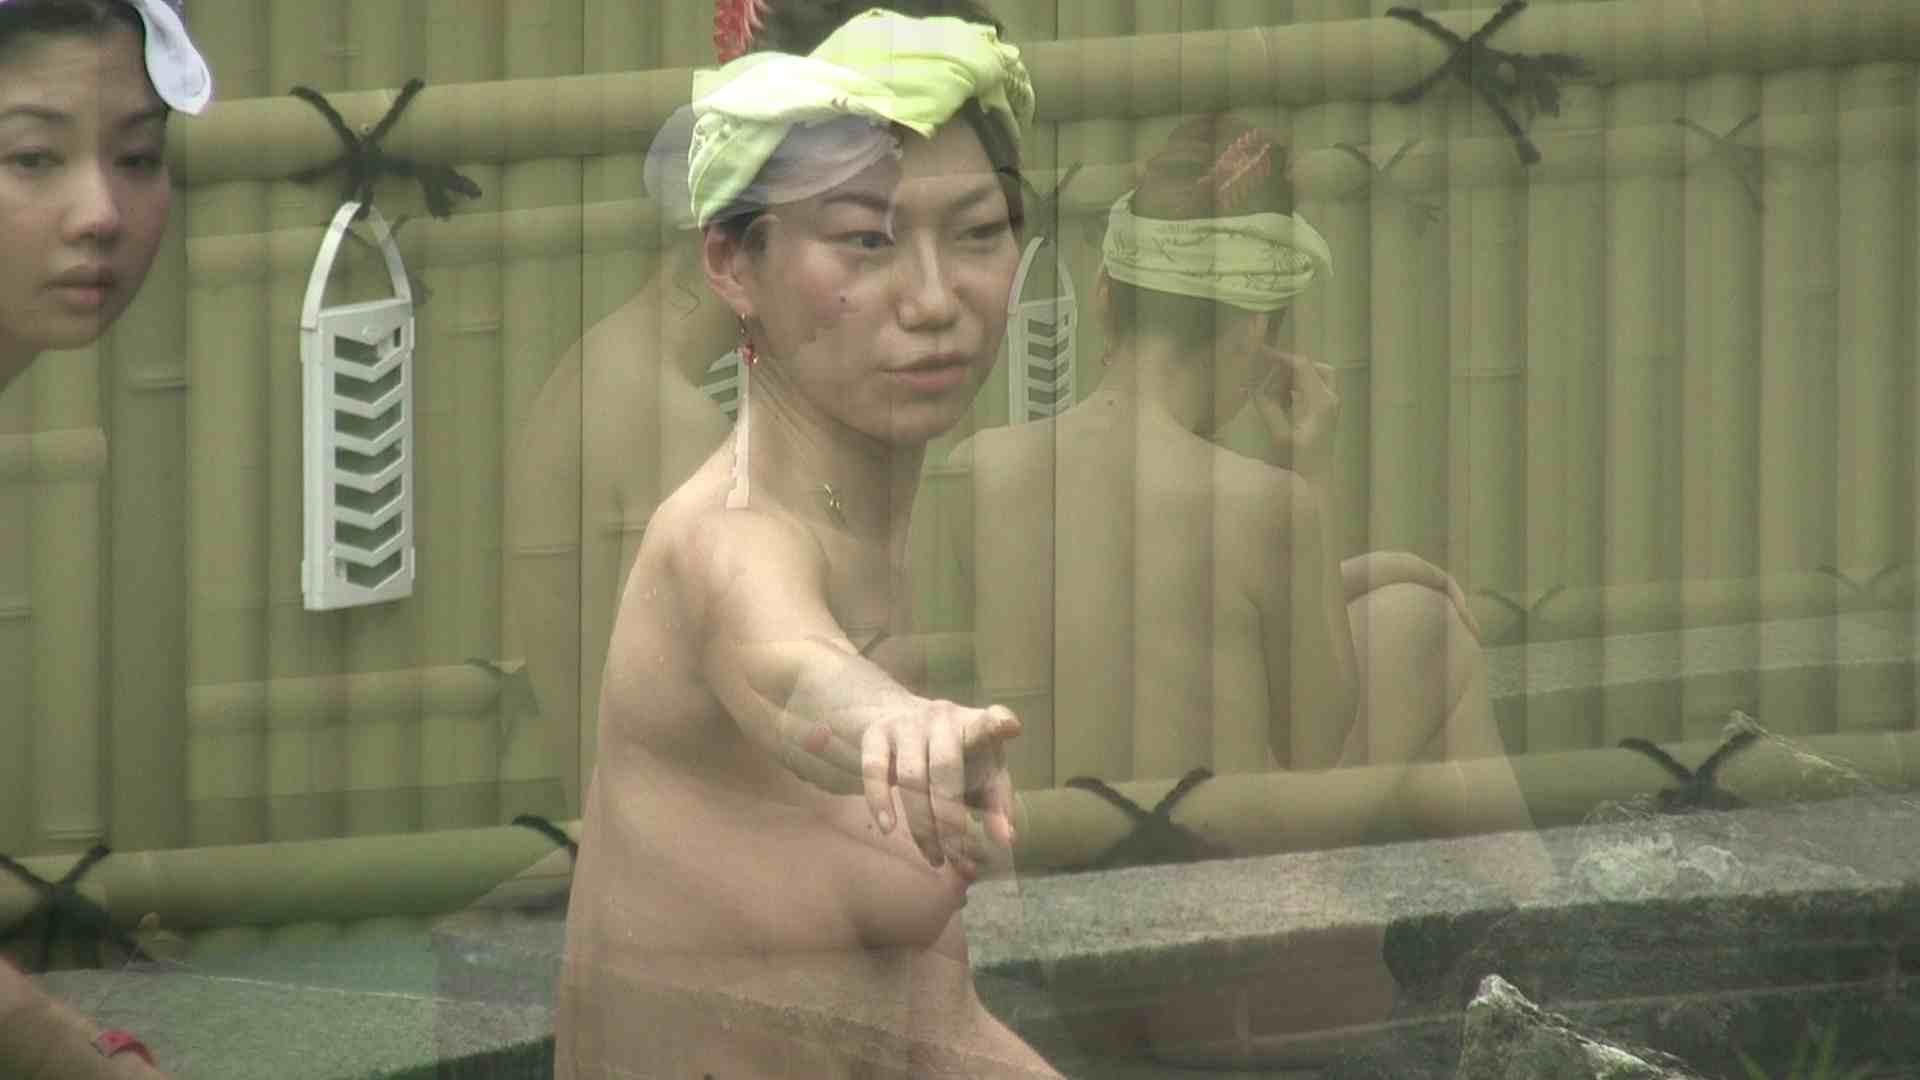 Aquaな露天風呂Vol.192 露天風呂突入 | 盗撮師作品  101pic 64